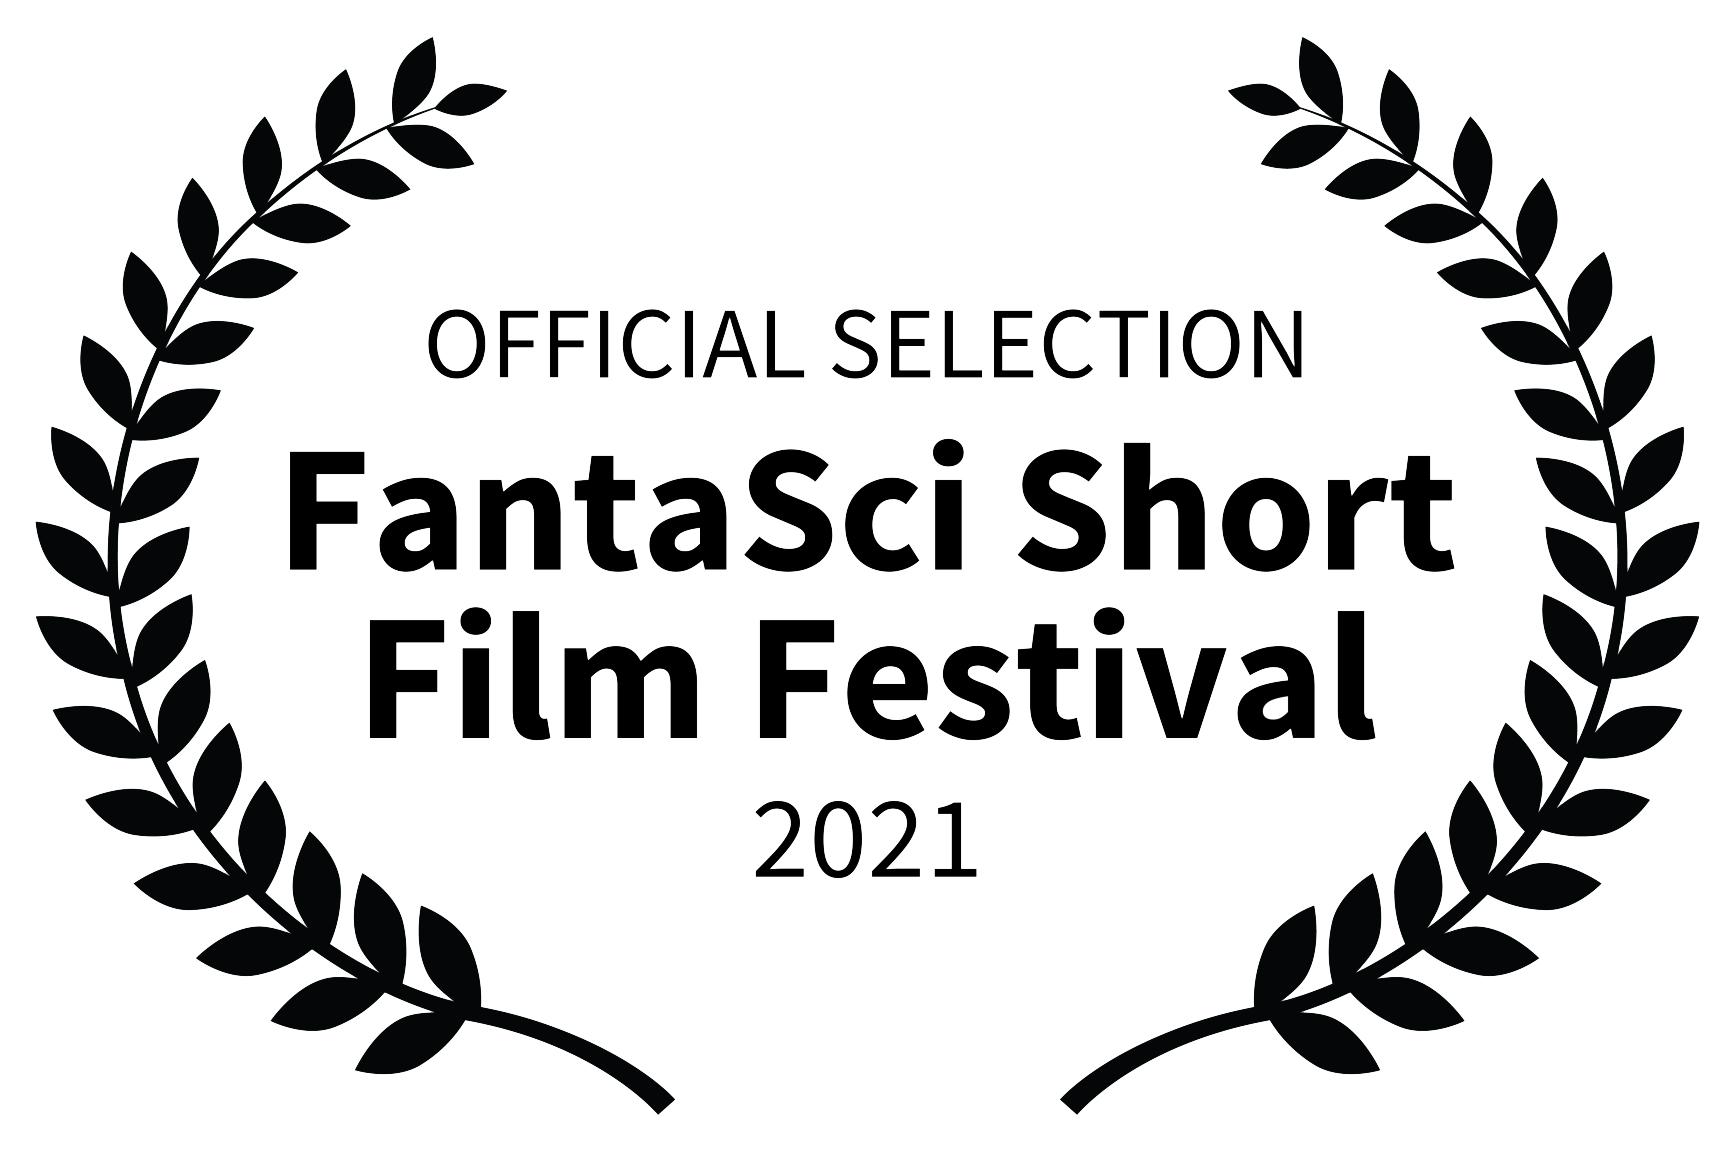 OFFICIAL-SELECTION---FantaSci-Short-Film-Festival---2021